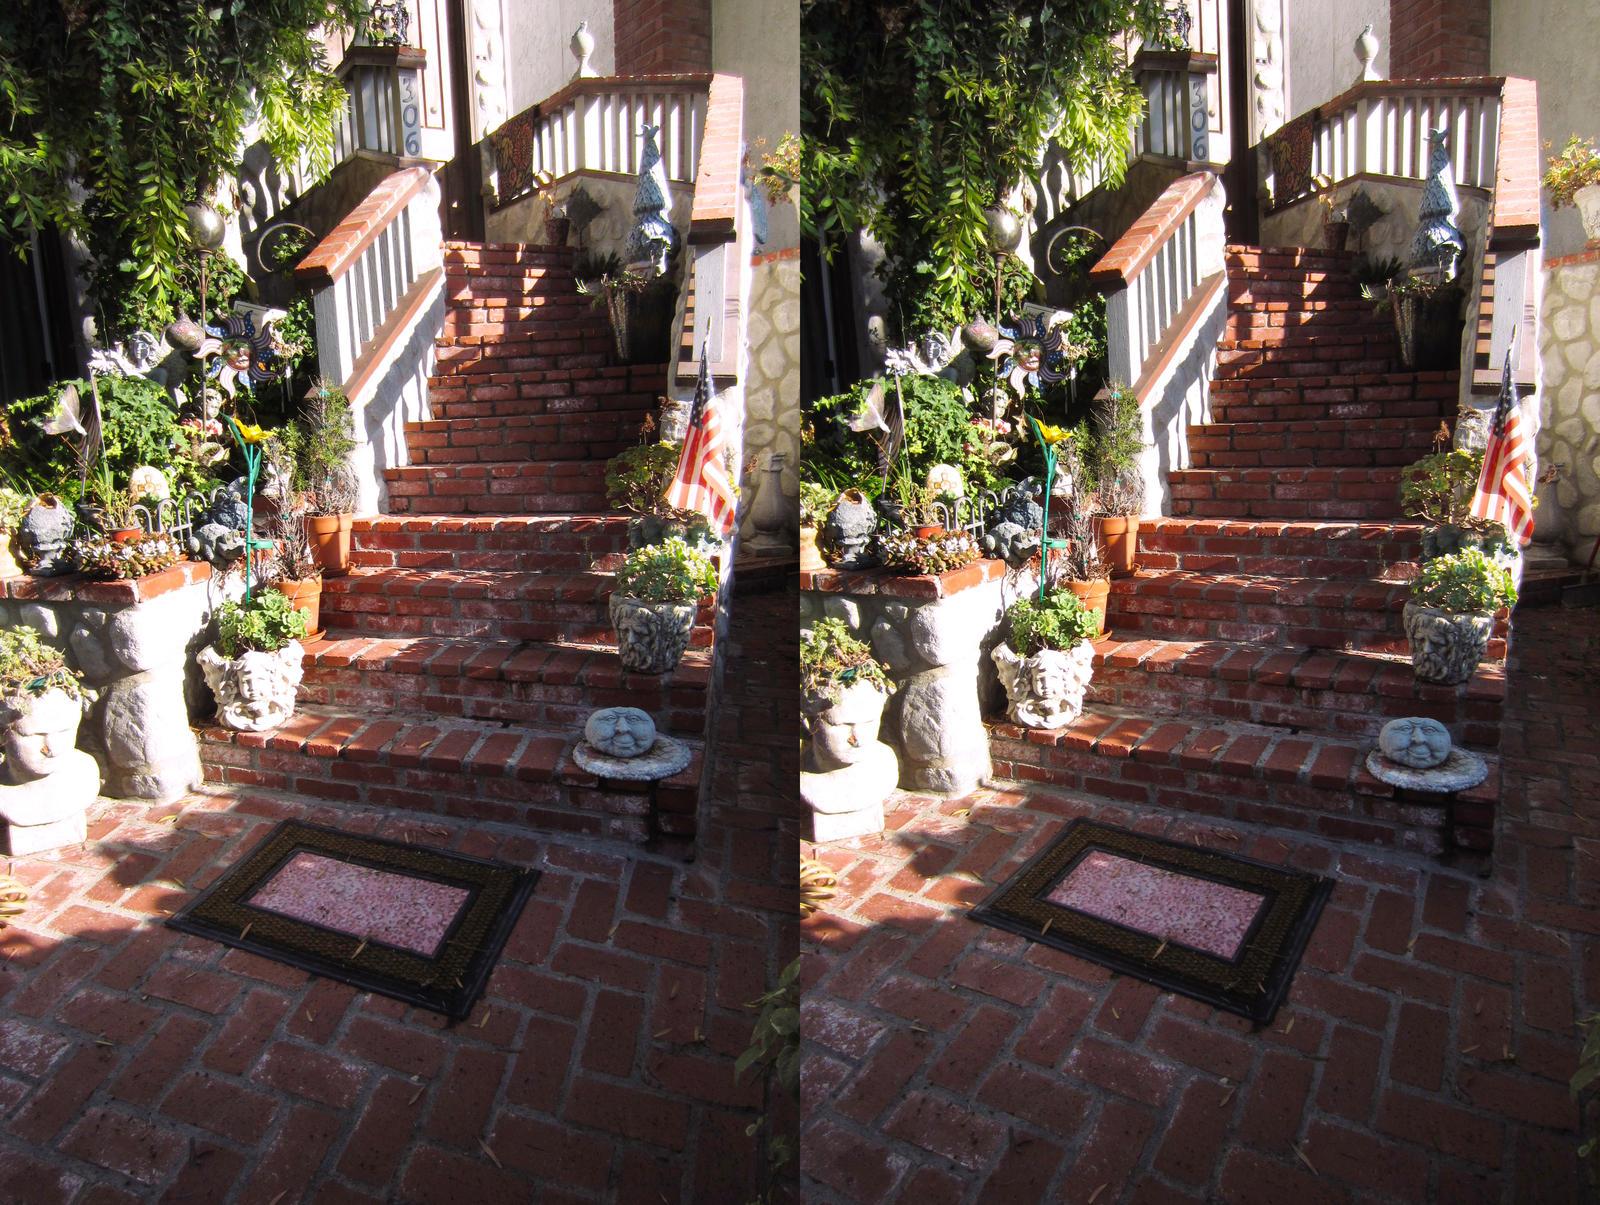 Stereograph - Brick Steps by alanbecker